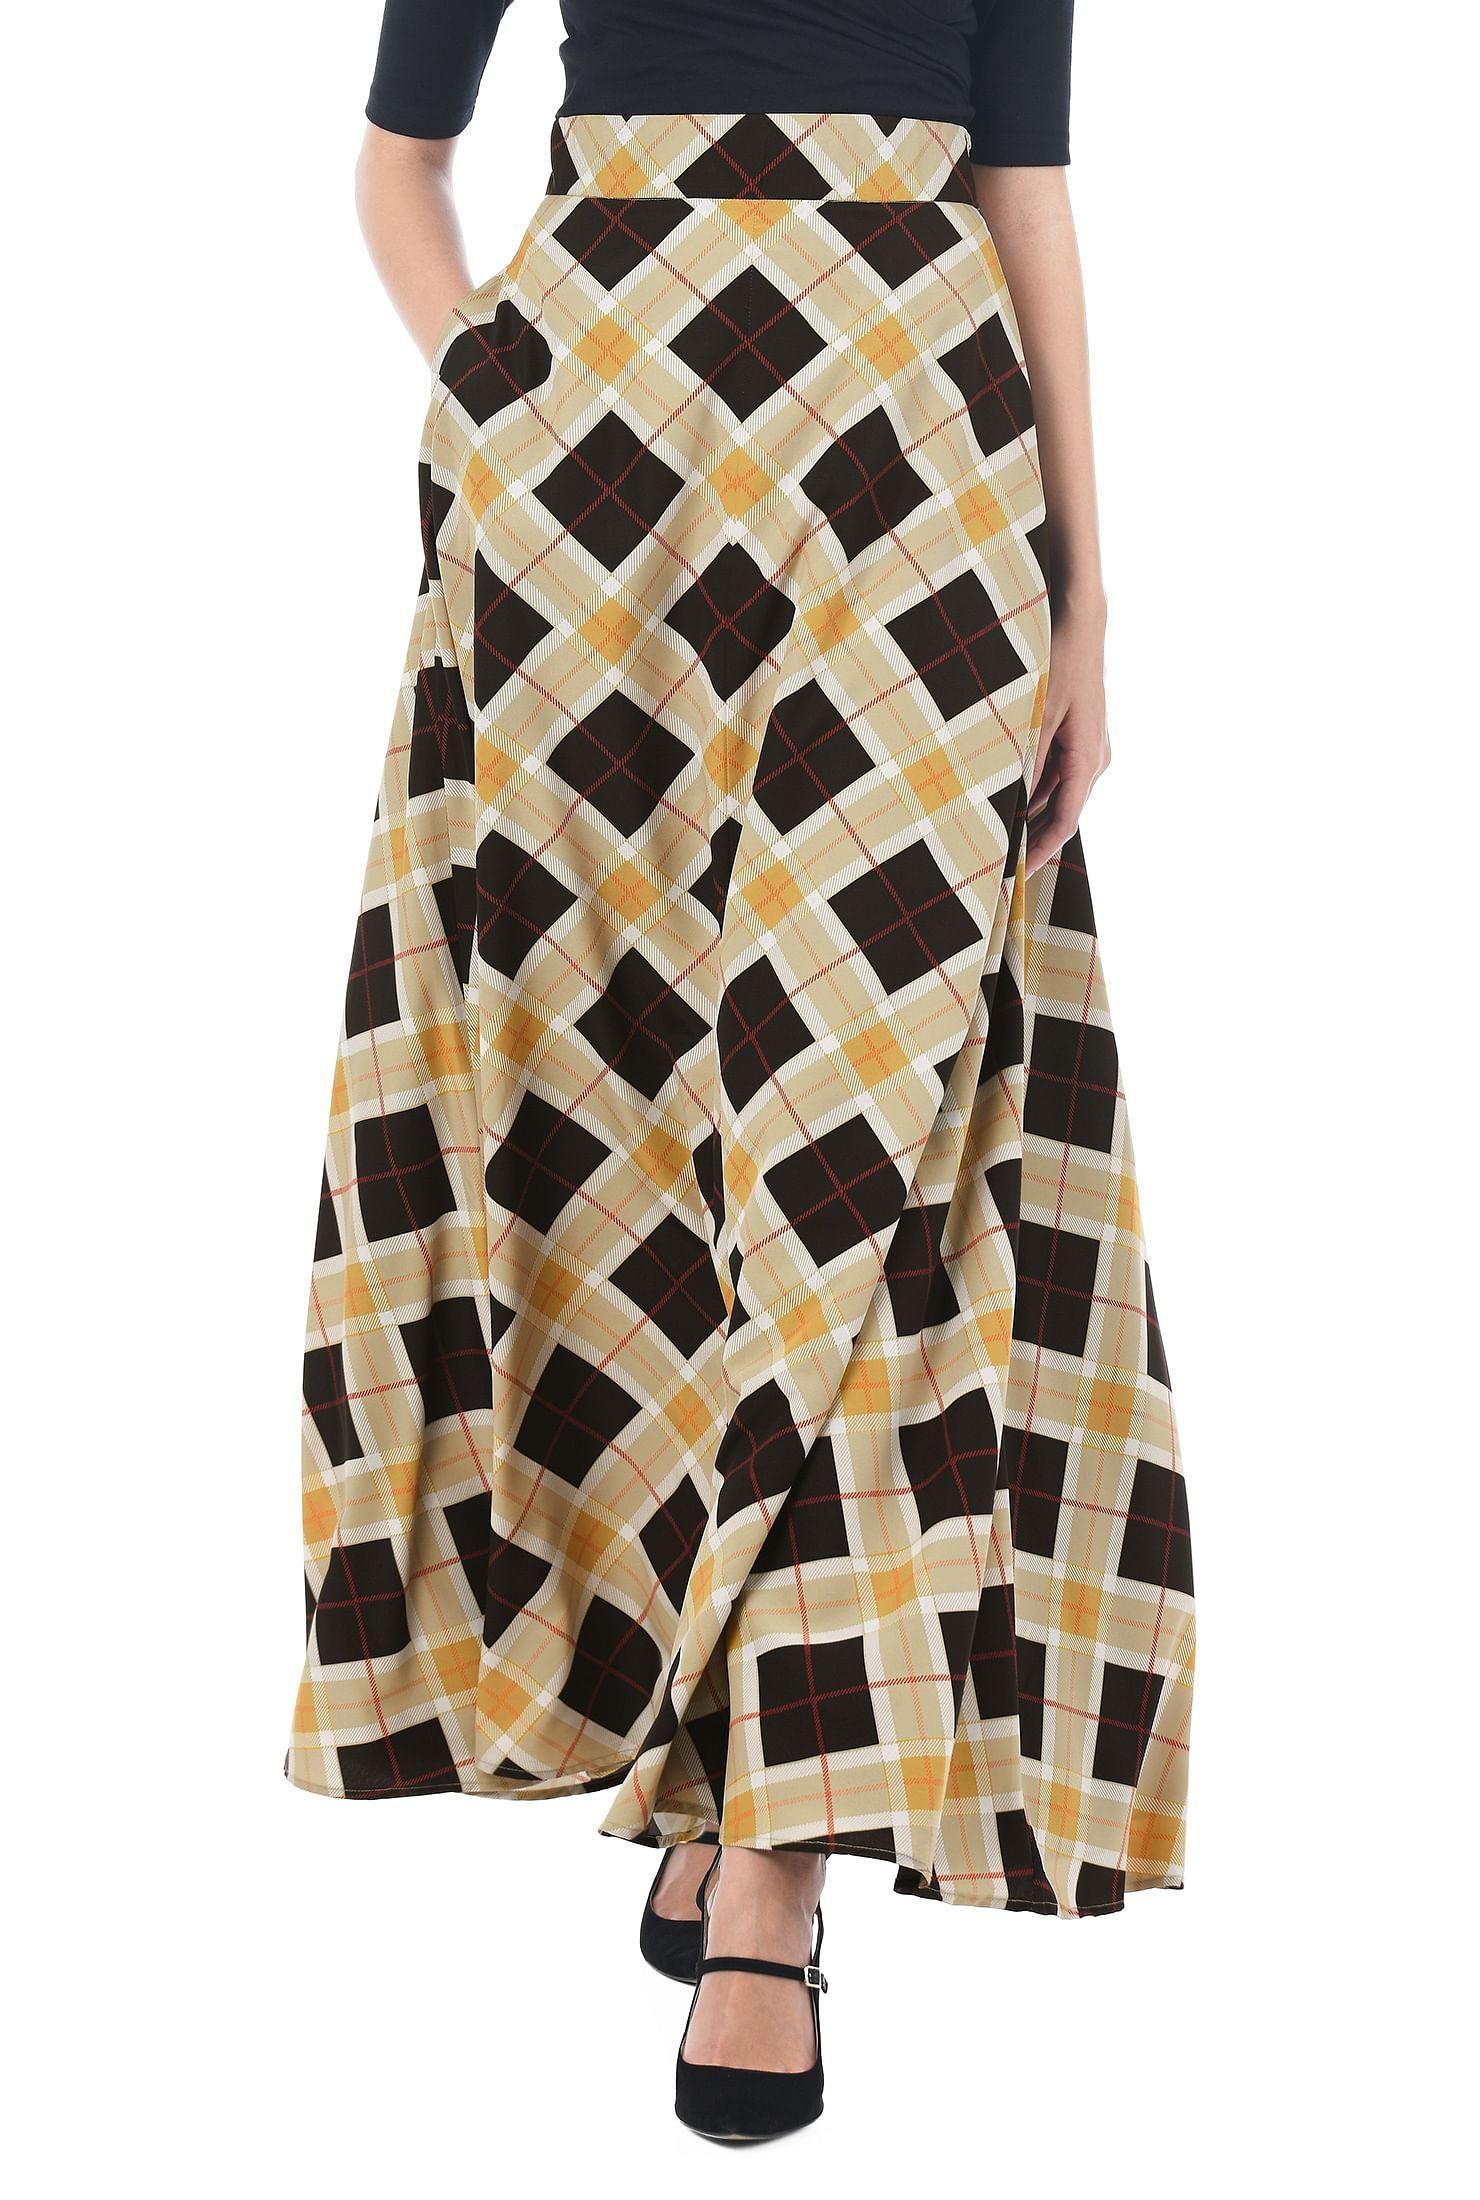 549a7f9dbe9 banded elastic waist skirts, Crepe Skirts, digital print skirts, full  length skirts